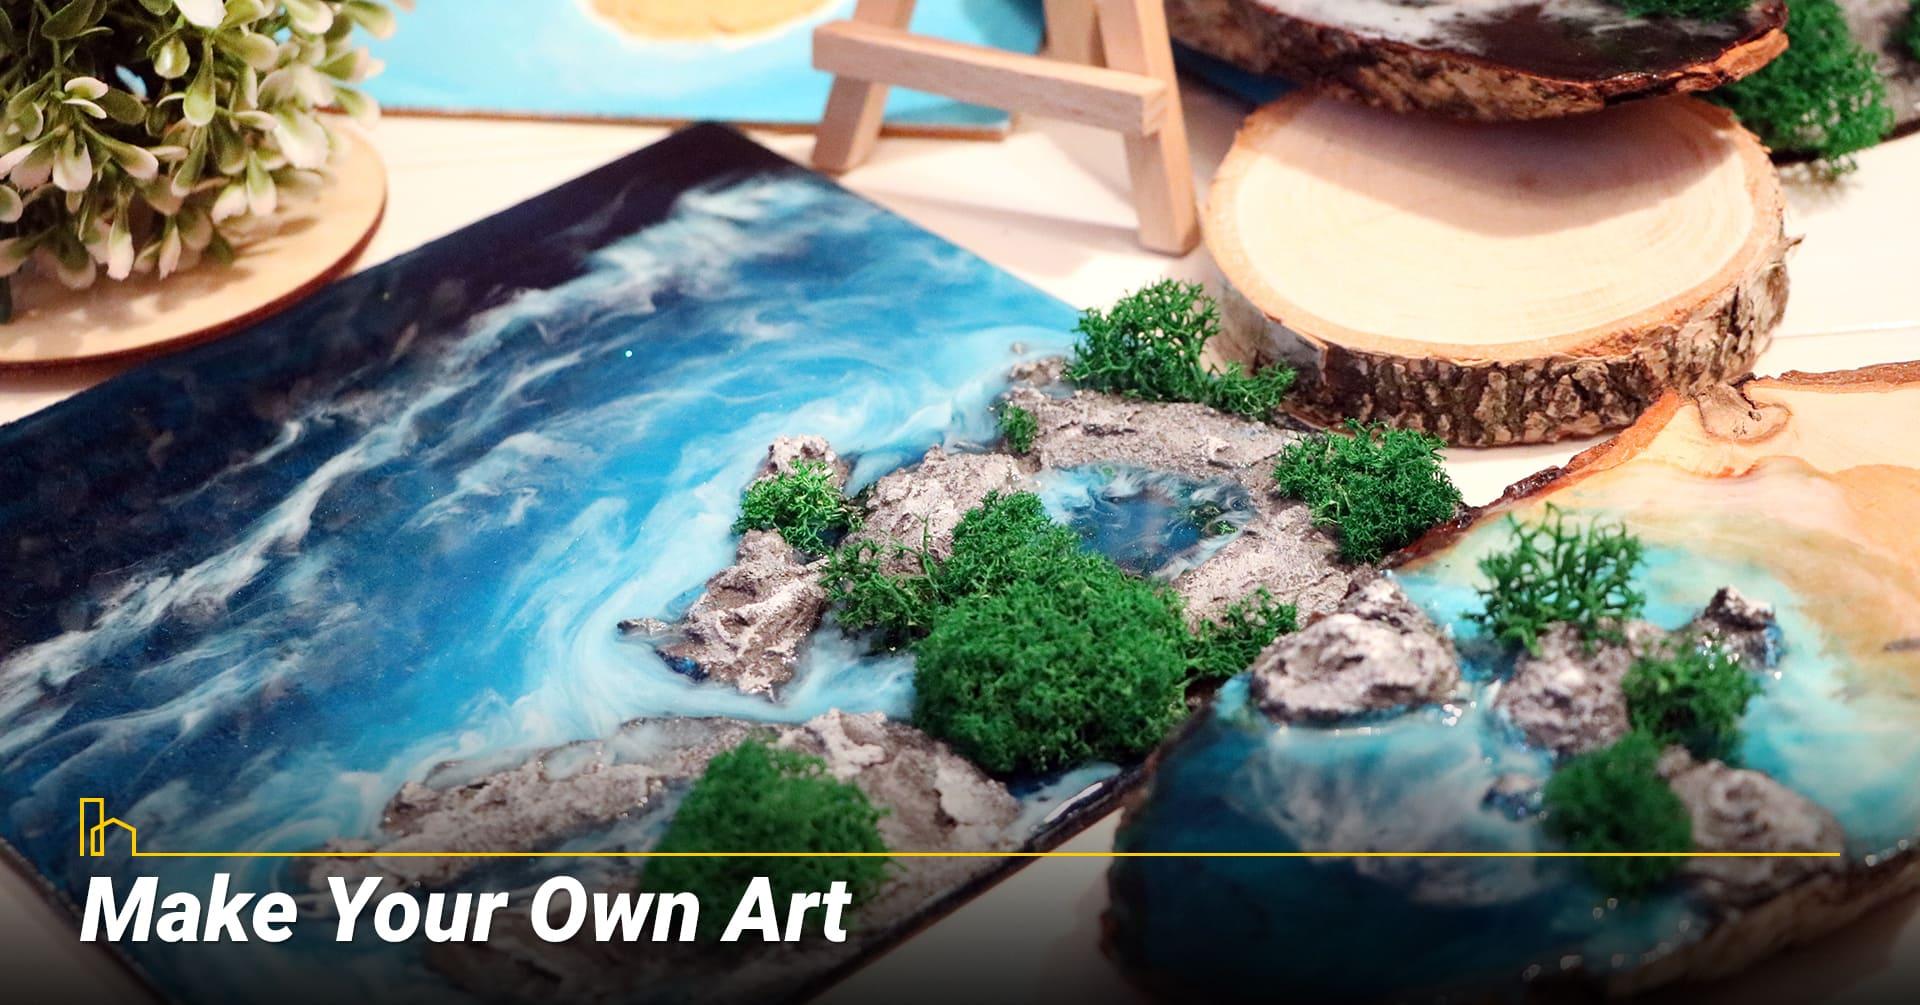 Make Your Own Art, DIY art pieces